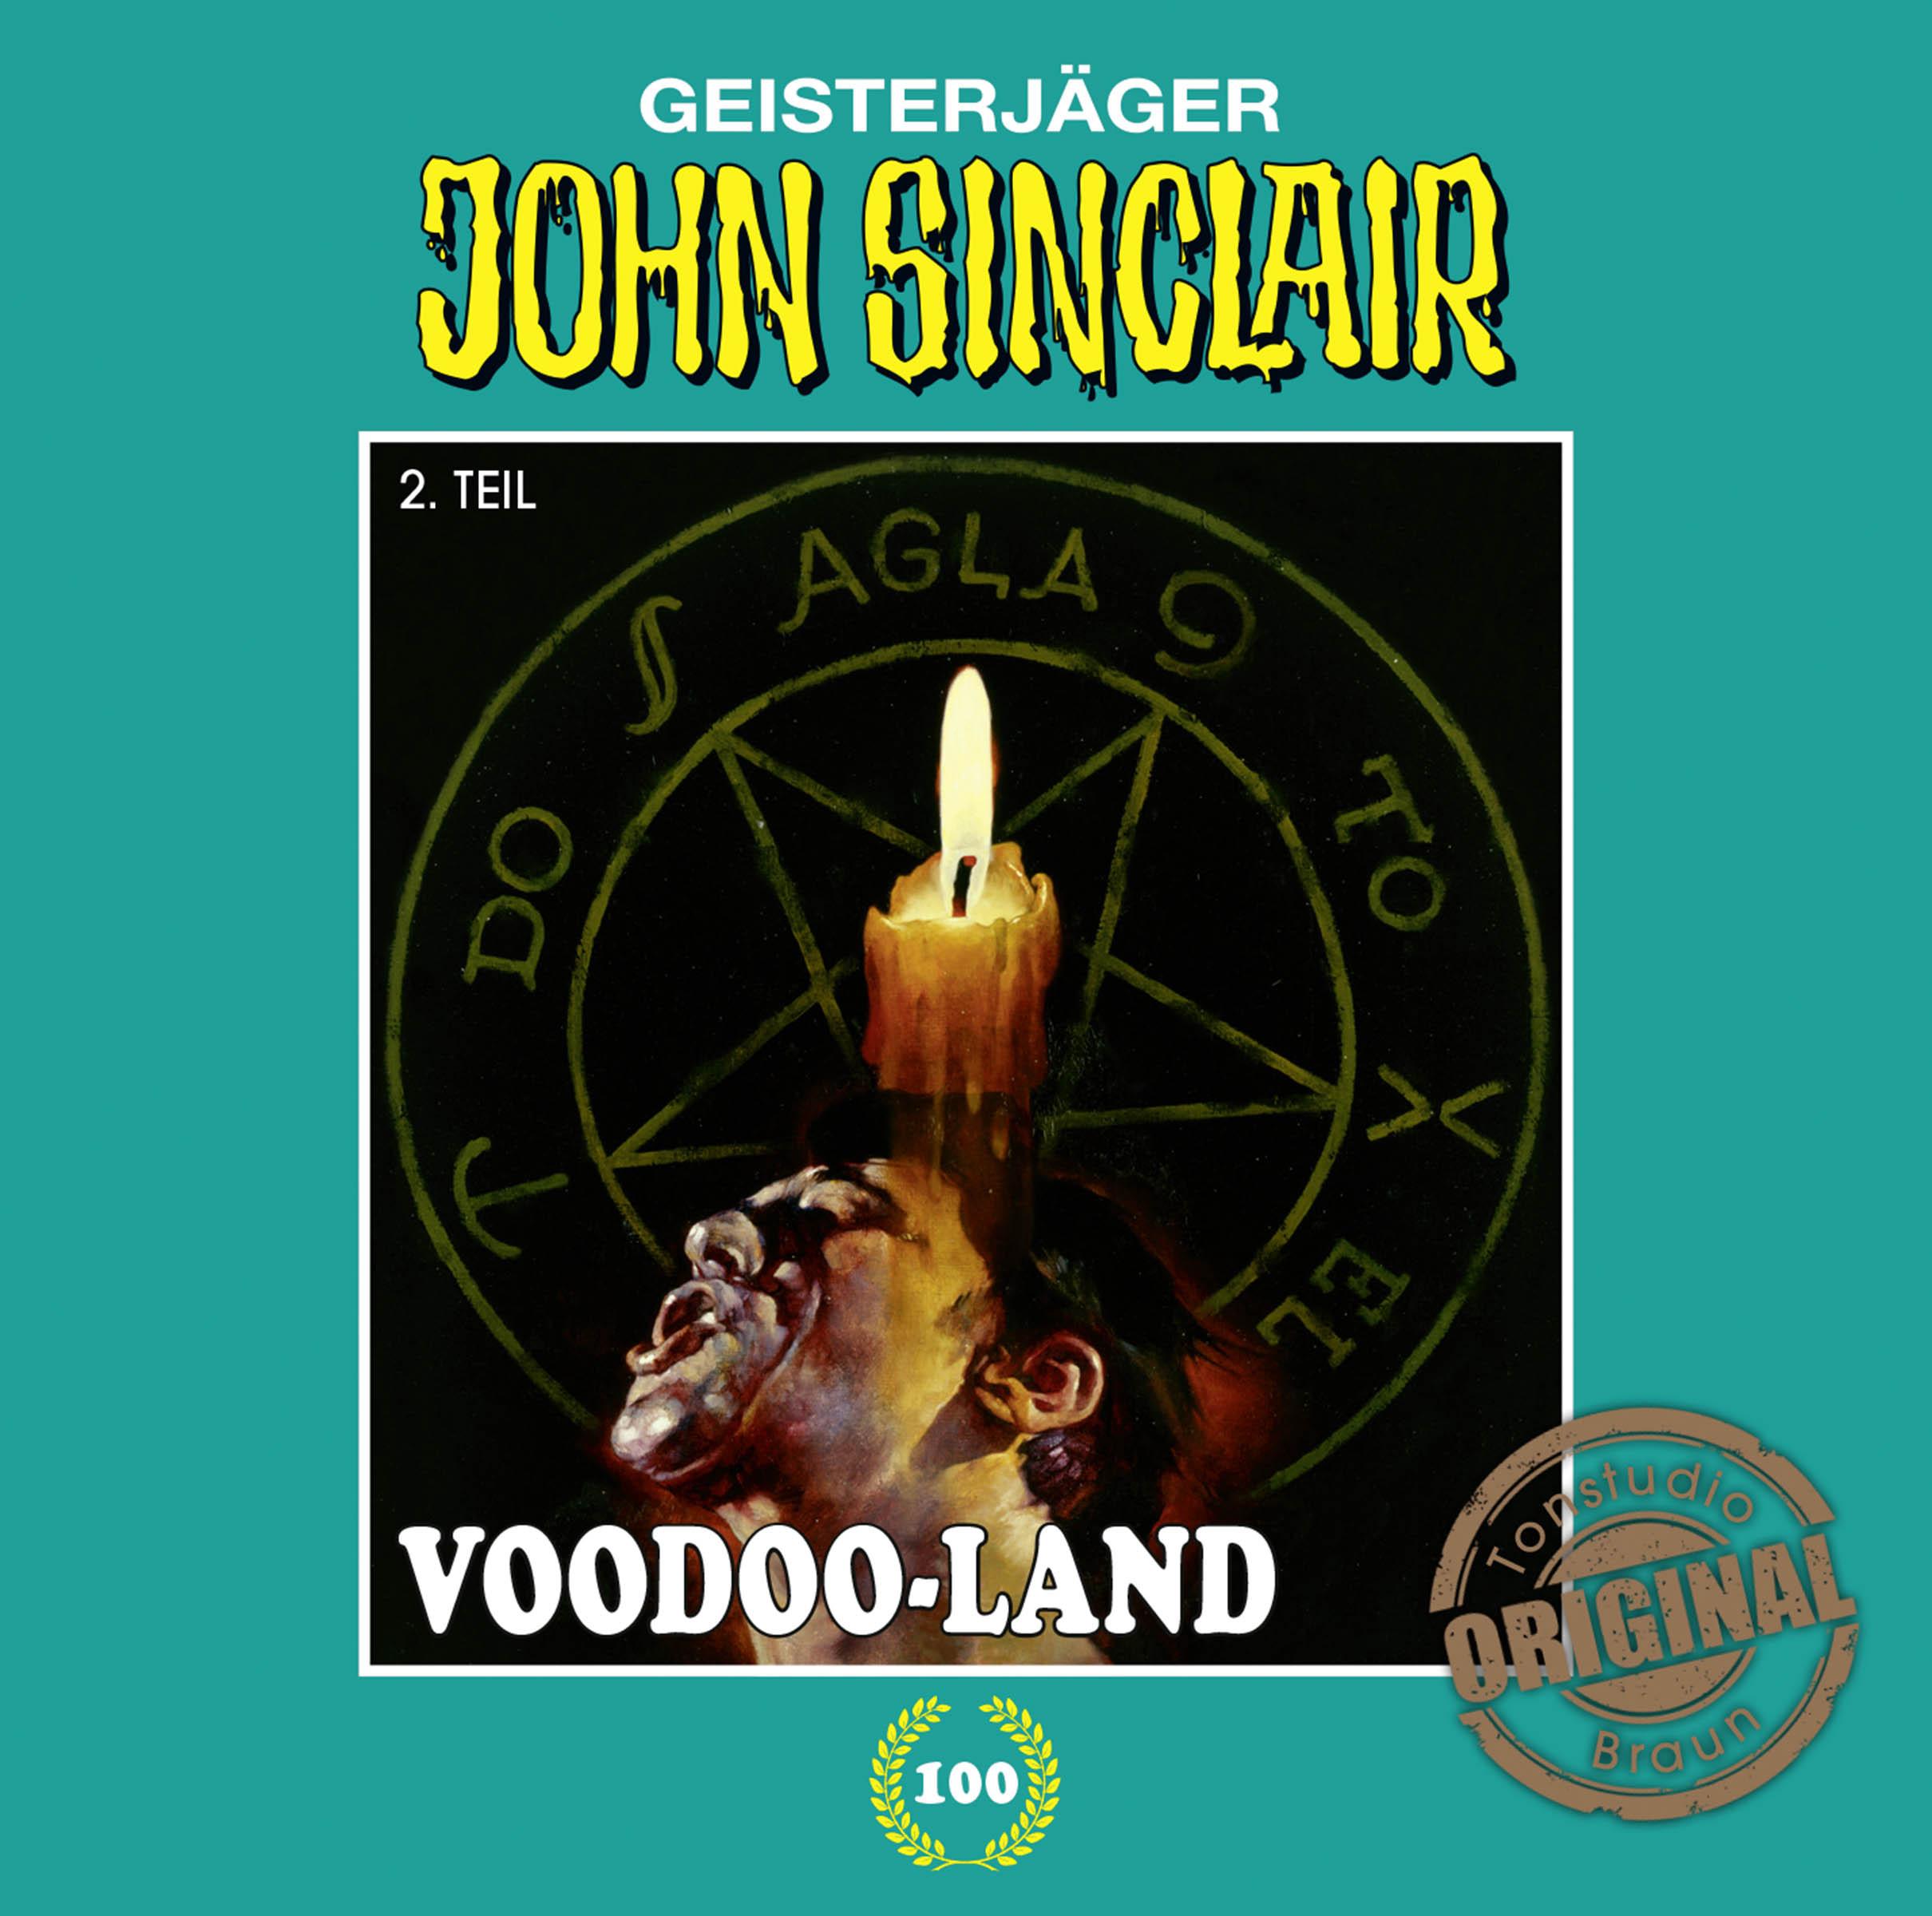 John Sinclair Tonstudio Braun - Folge 100: Voodoo-Land (Teil 2 von 2) + Bonus-CD